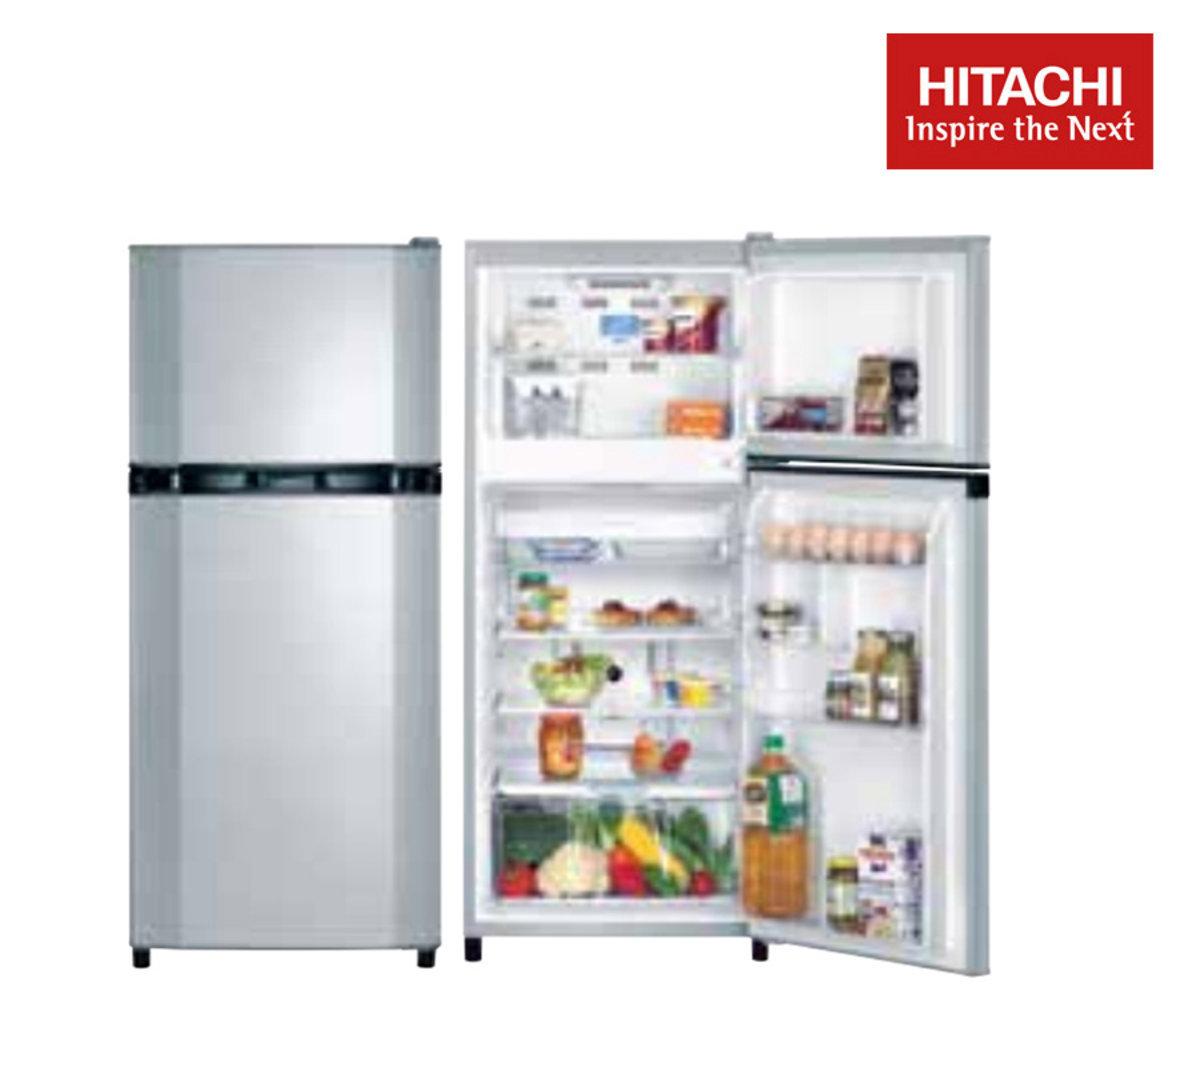 2-Door Refrigerator 169L (Silver) R-T170E7H